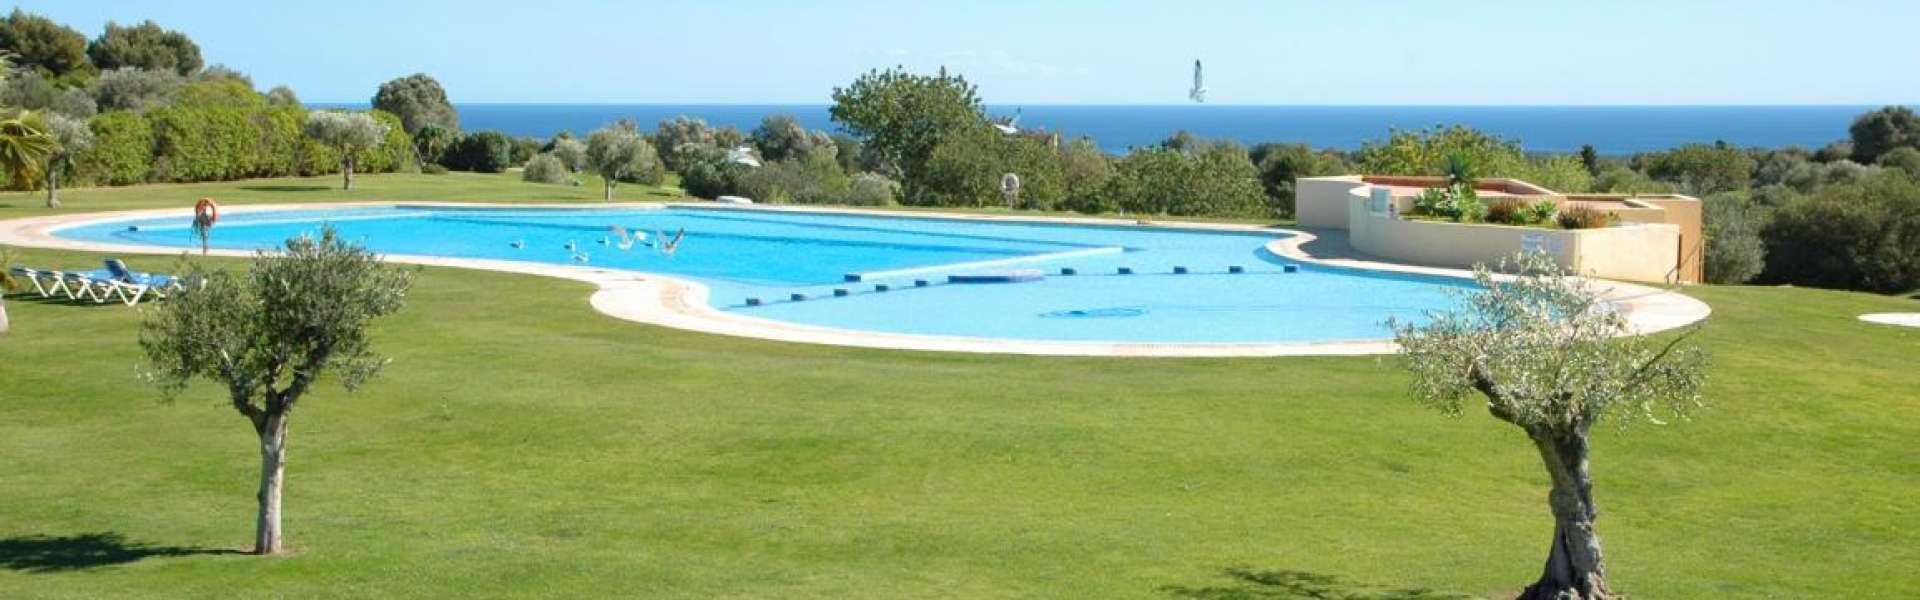 Meerblickwohnung am Golfplatz Vall D'Or zum Kauf